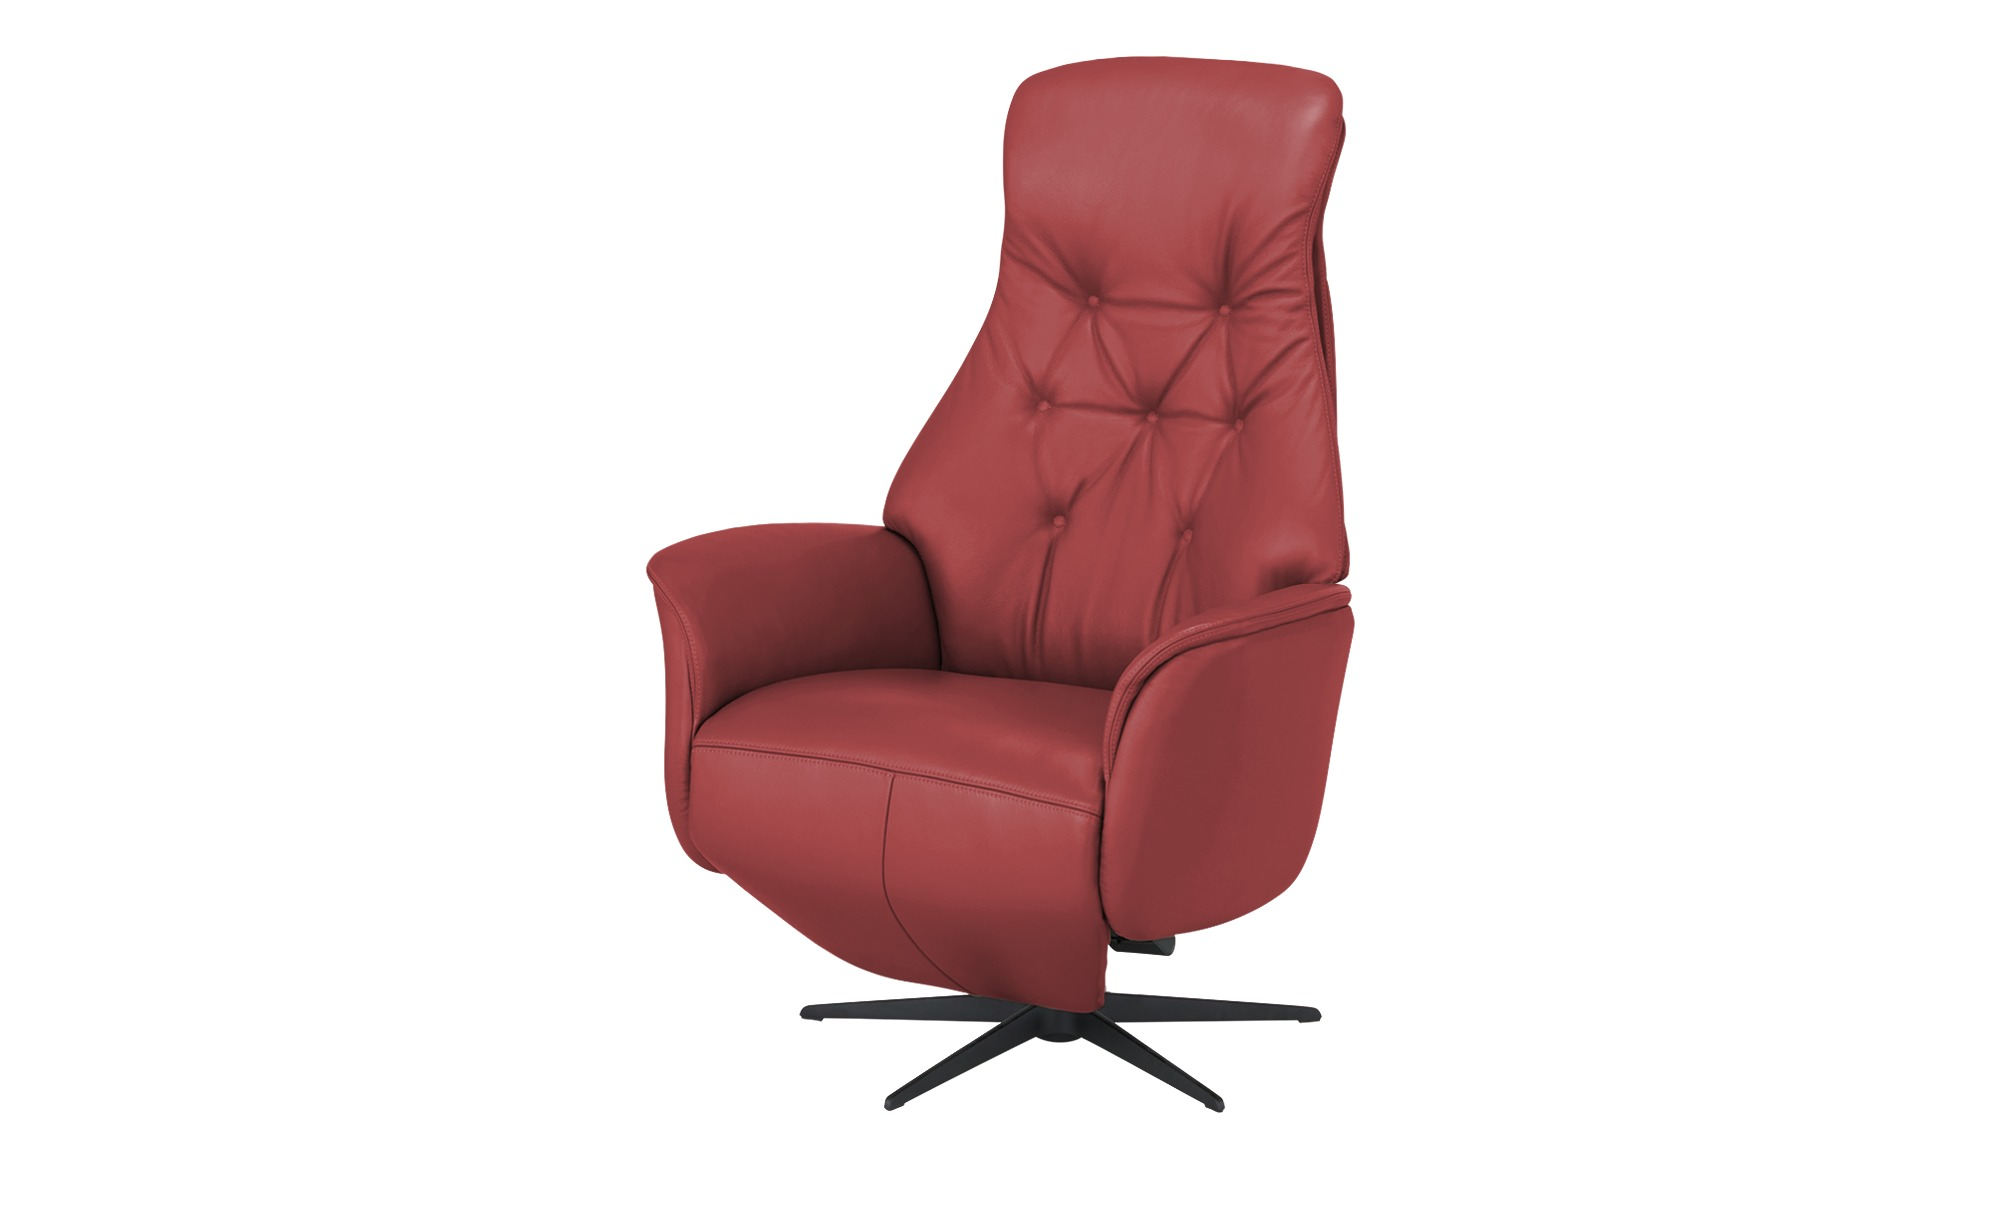 Nils Olsen Funktionssessel  Arend ¦ rot ¦ Maße (cm): B: 71 H: 118 T: 87 Polstermöbel > Sessel > Drehsessel - Höffner